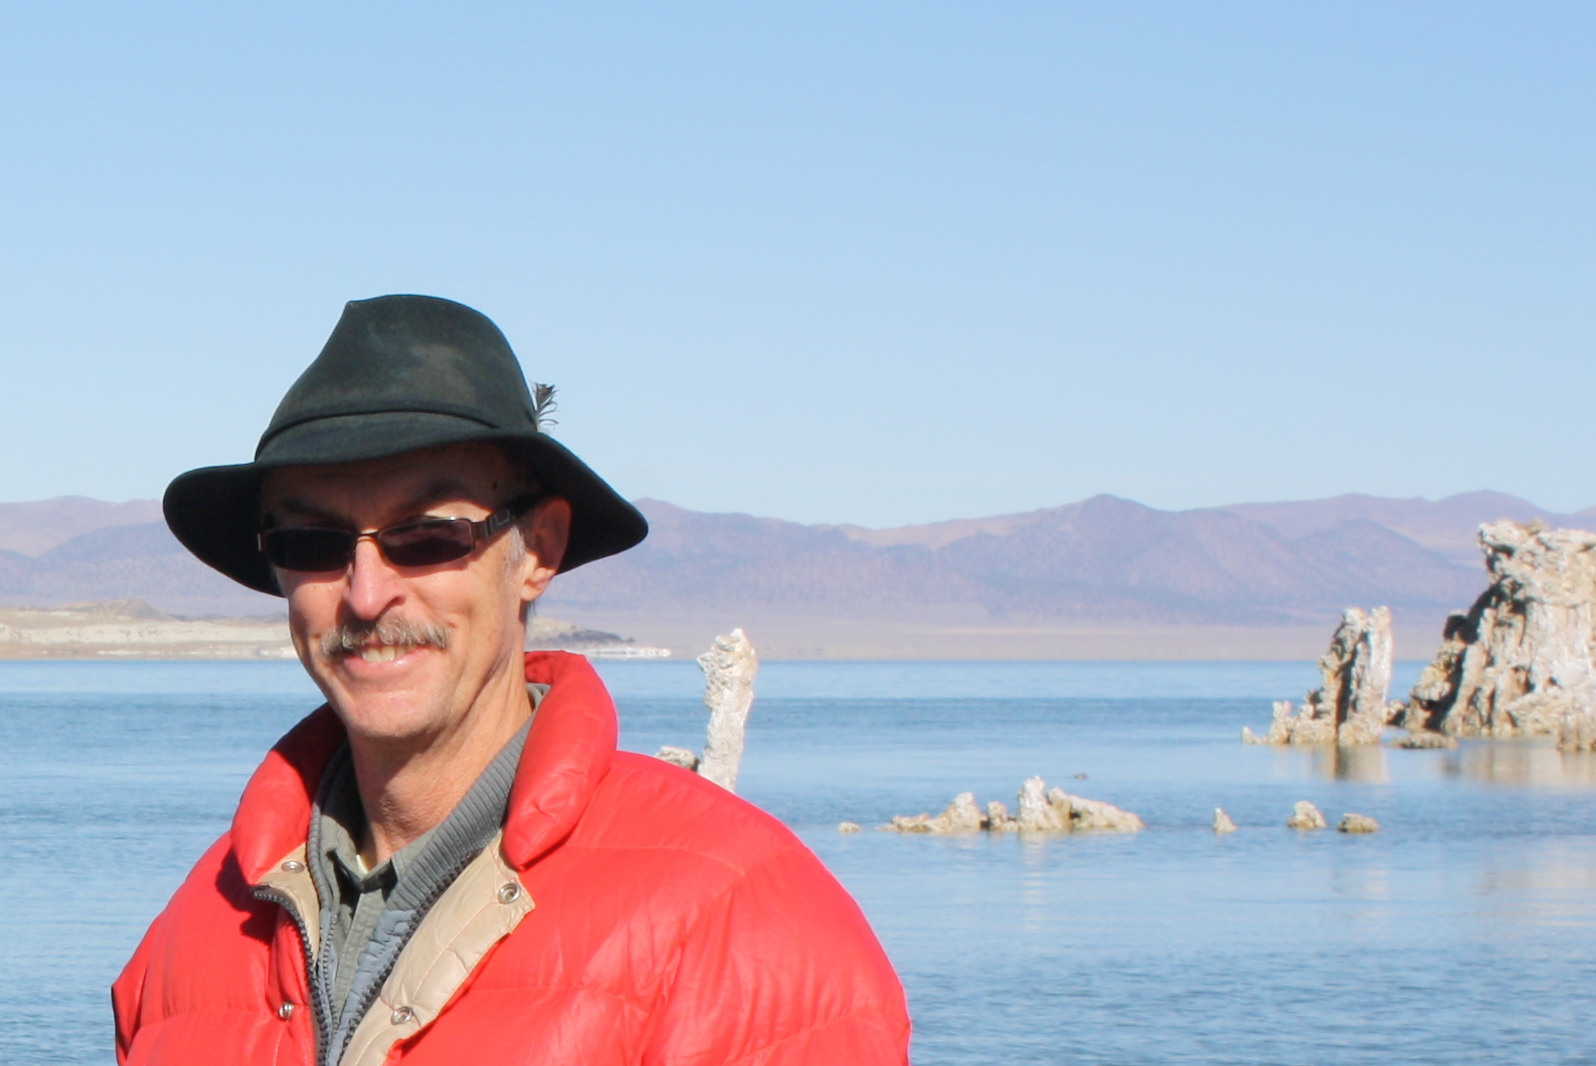 PROFESSOR: Doug Hammond - DEPARTMENT: Earth SciencesRATE MY PROFESSOR: